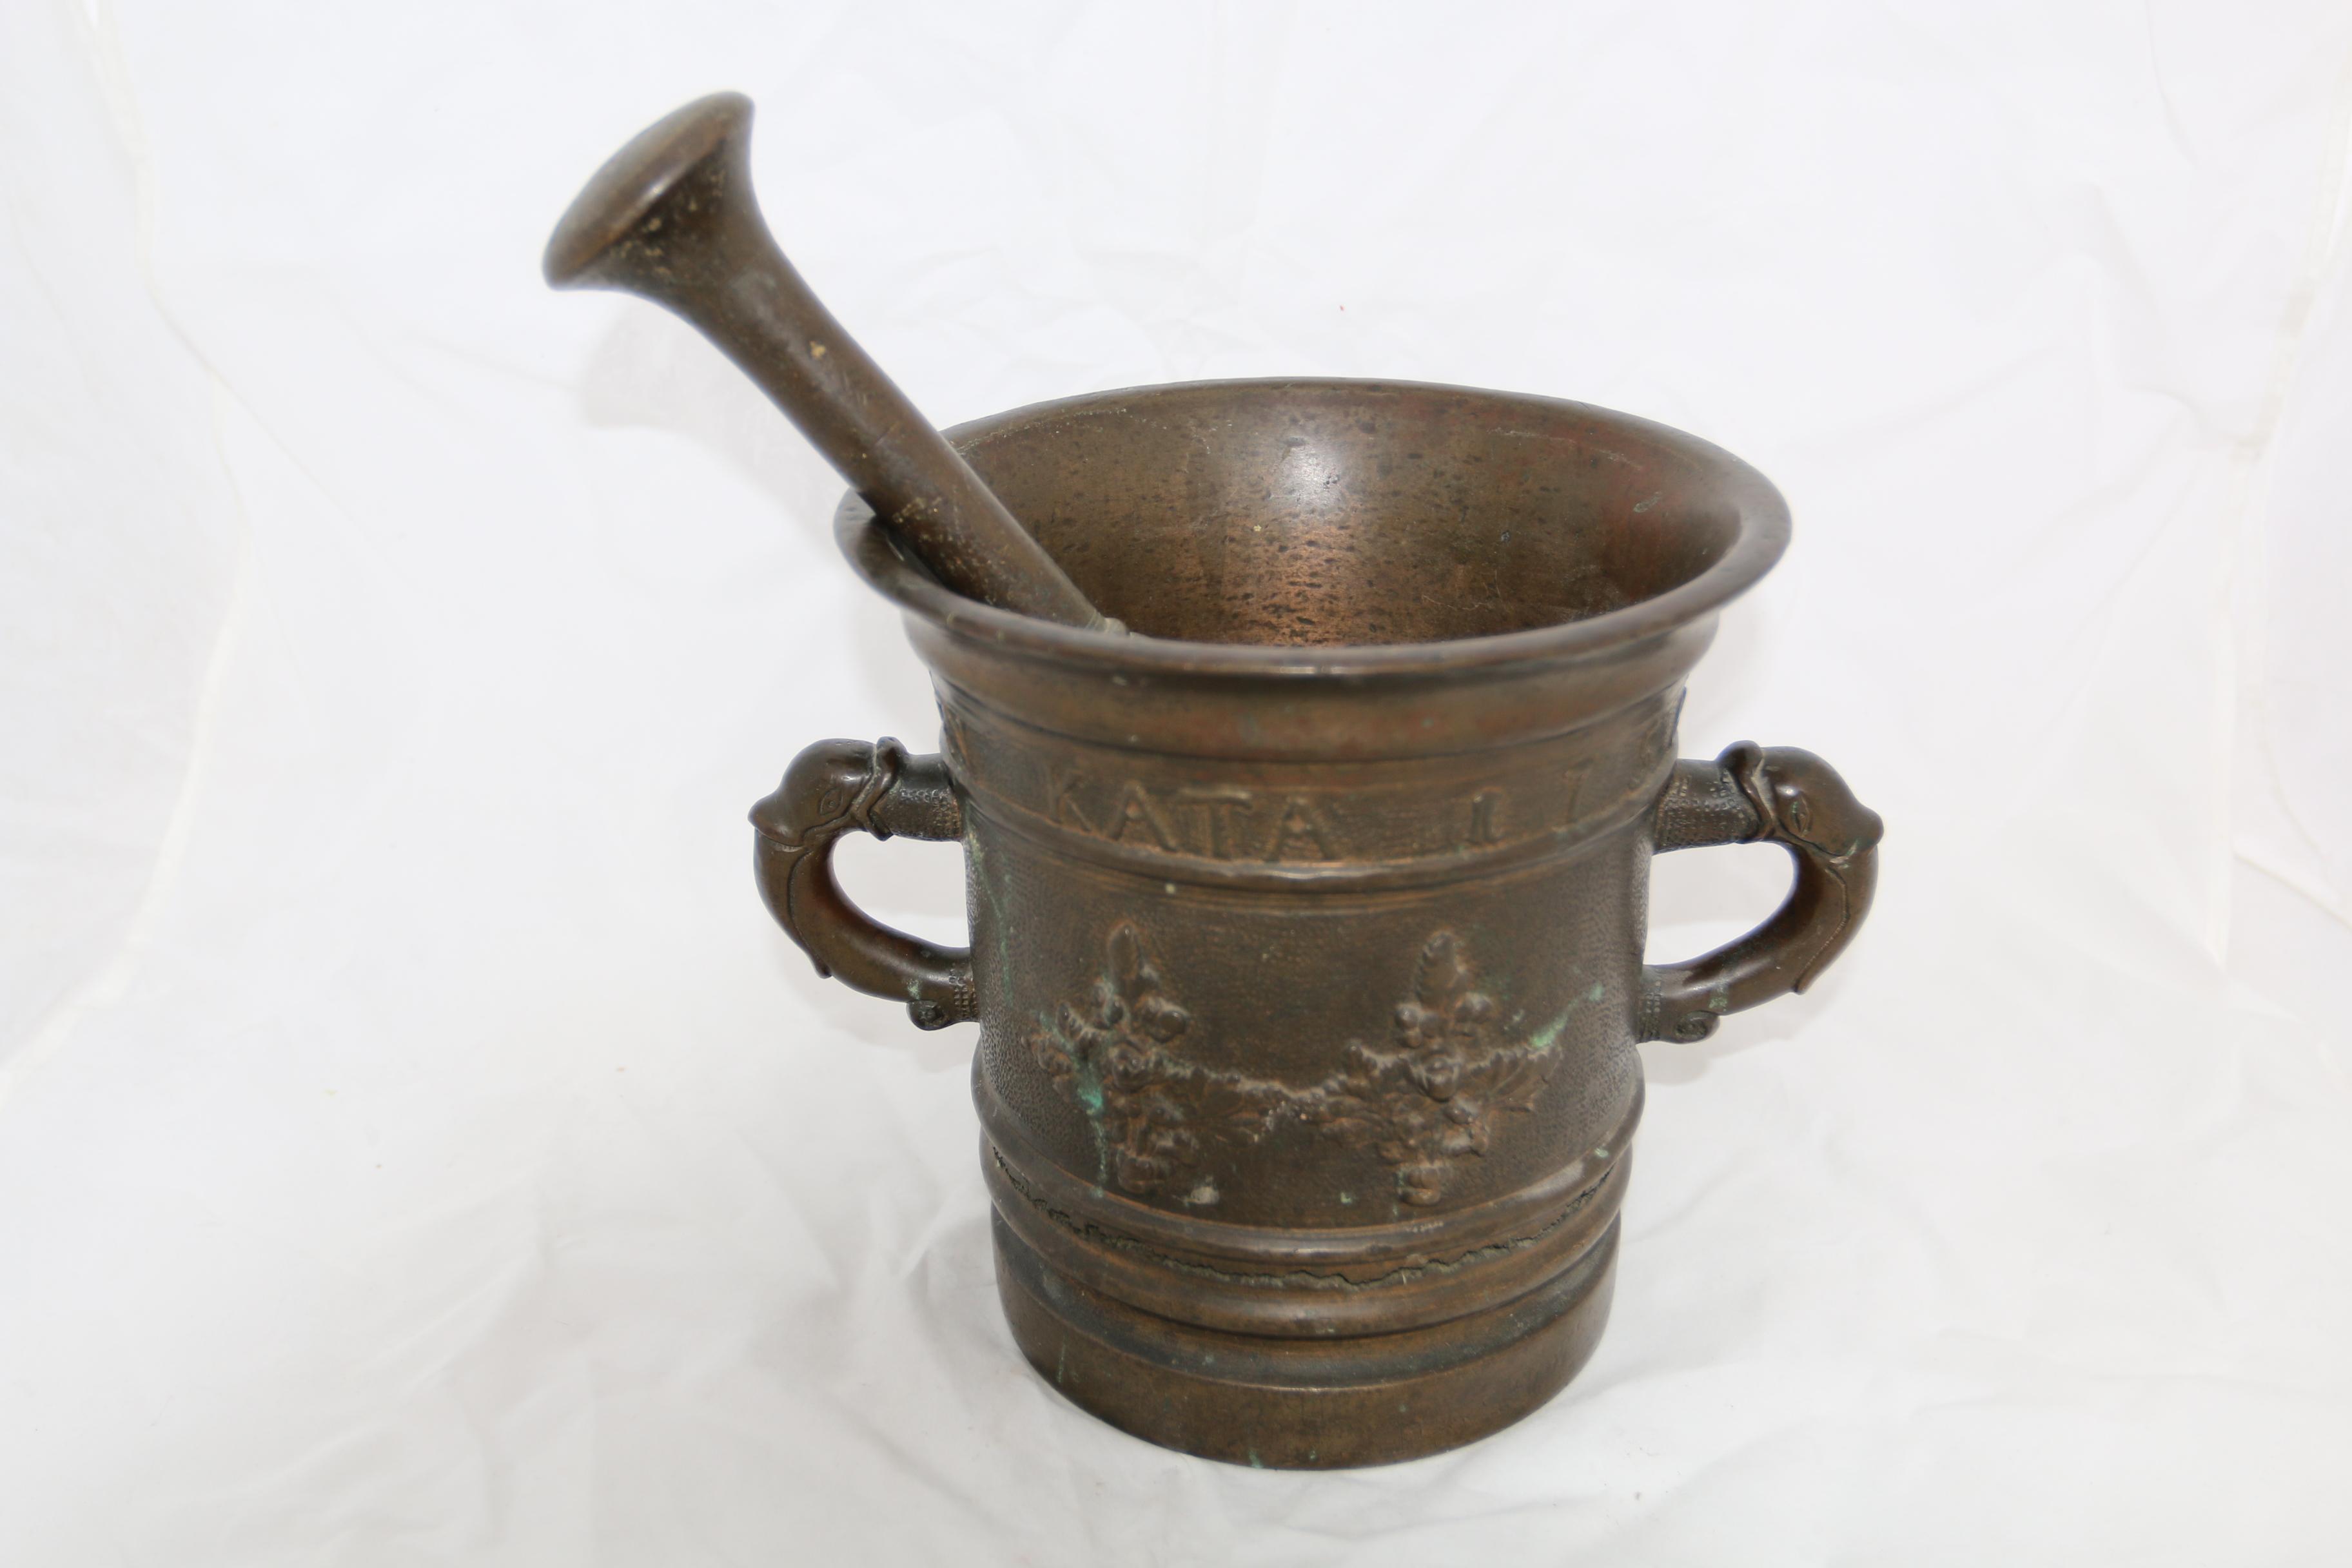 Kata Bethlen's mortar